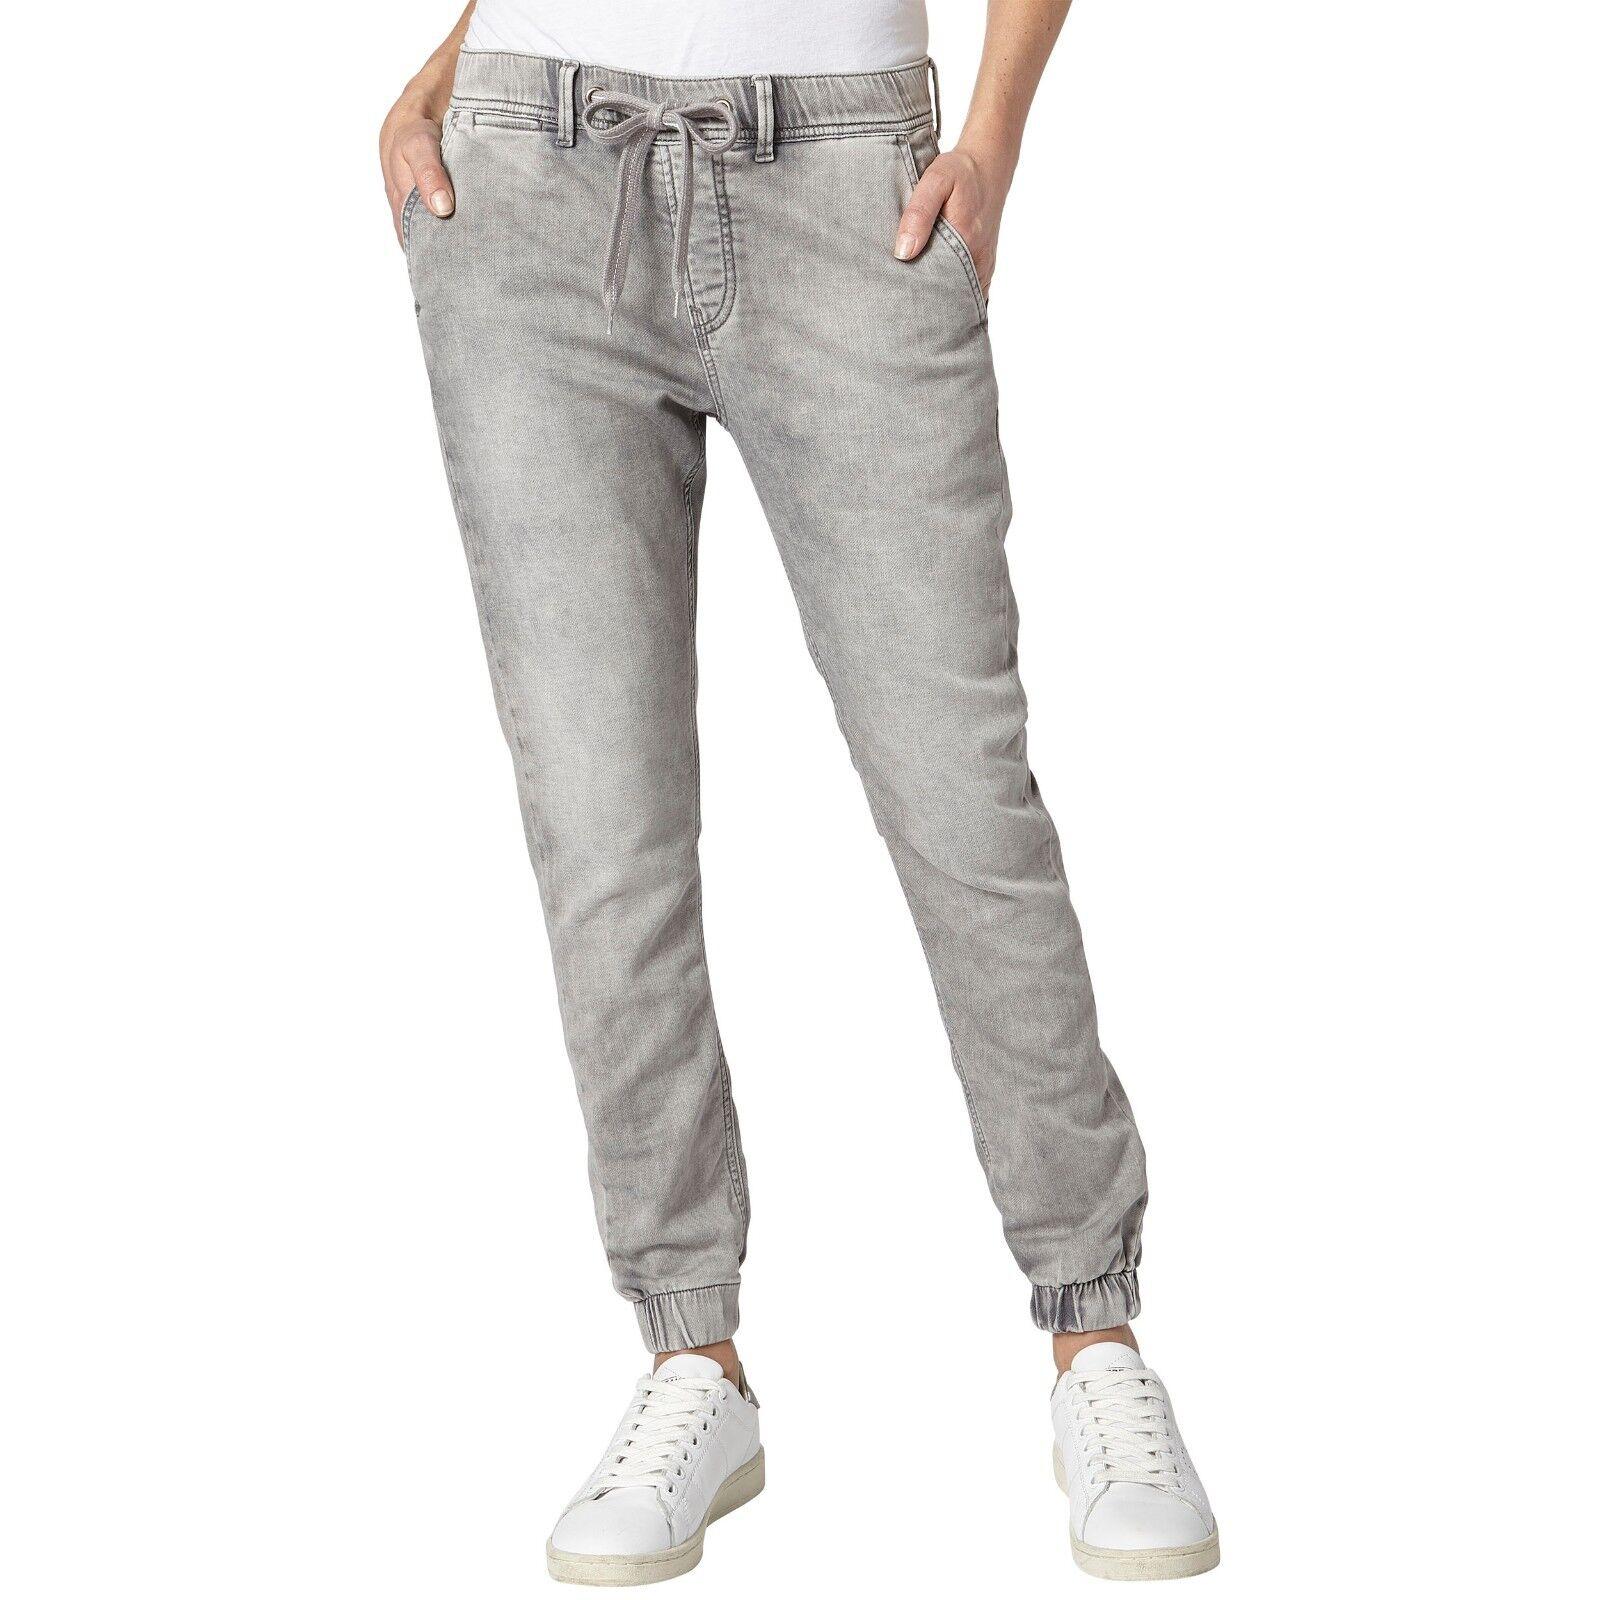 Pepe Jeans - COSIE Jeans Gymdigo Smokey